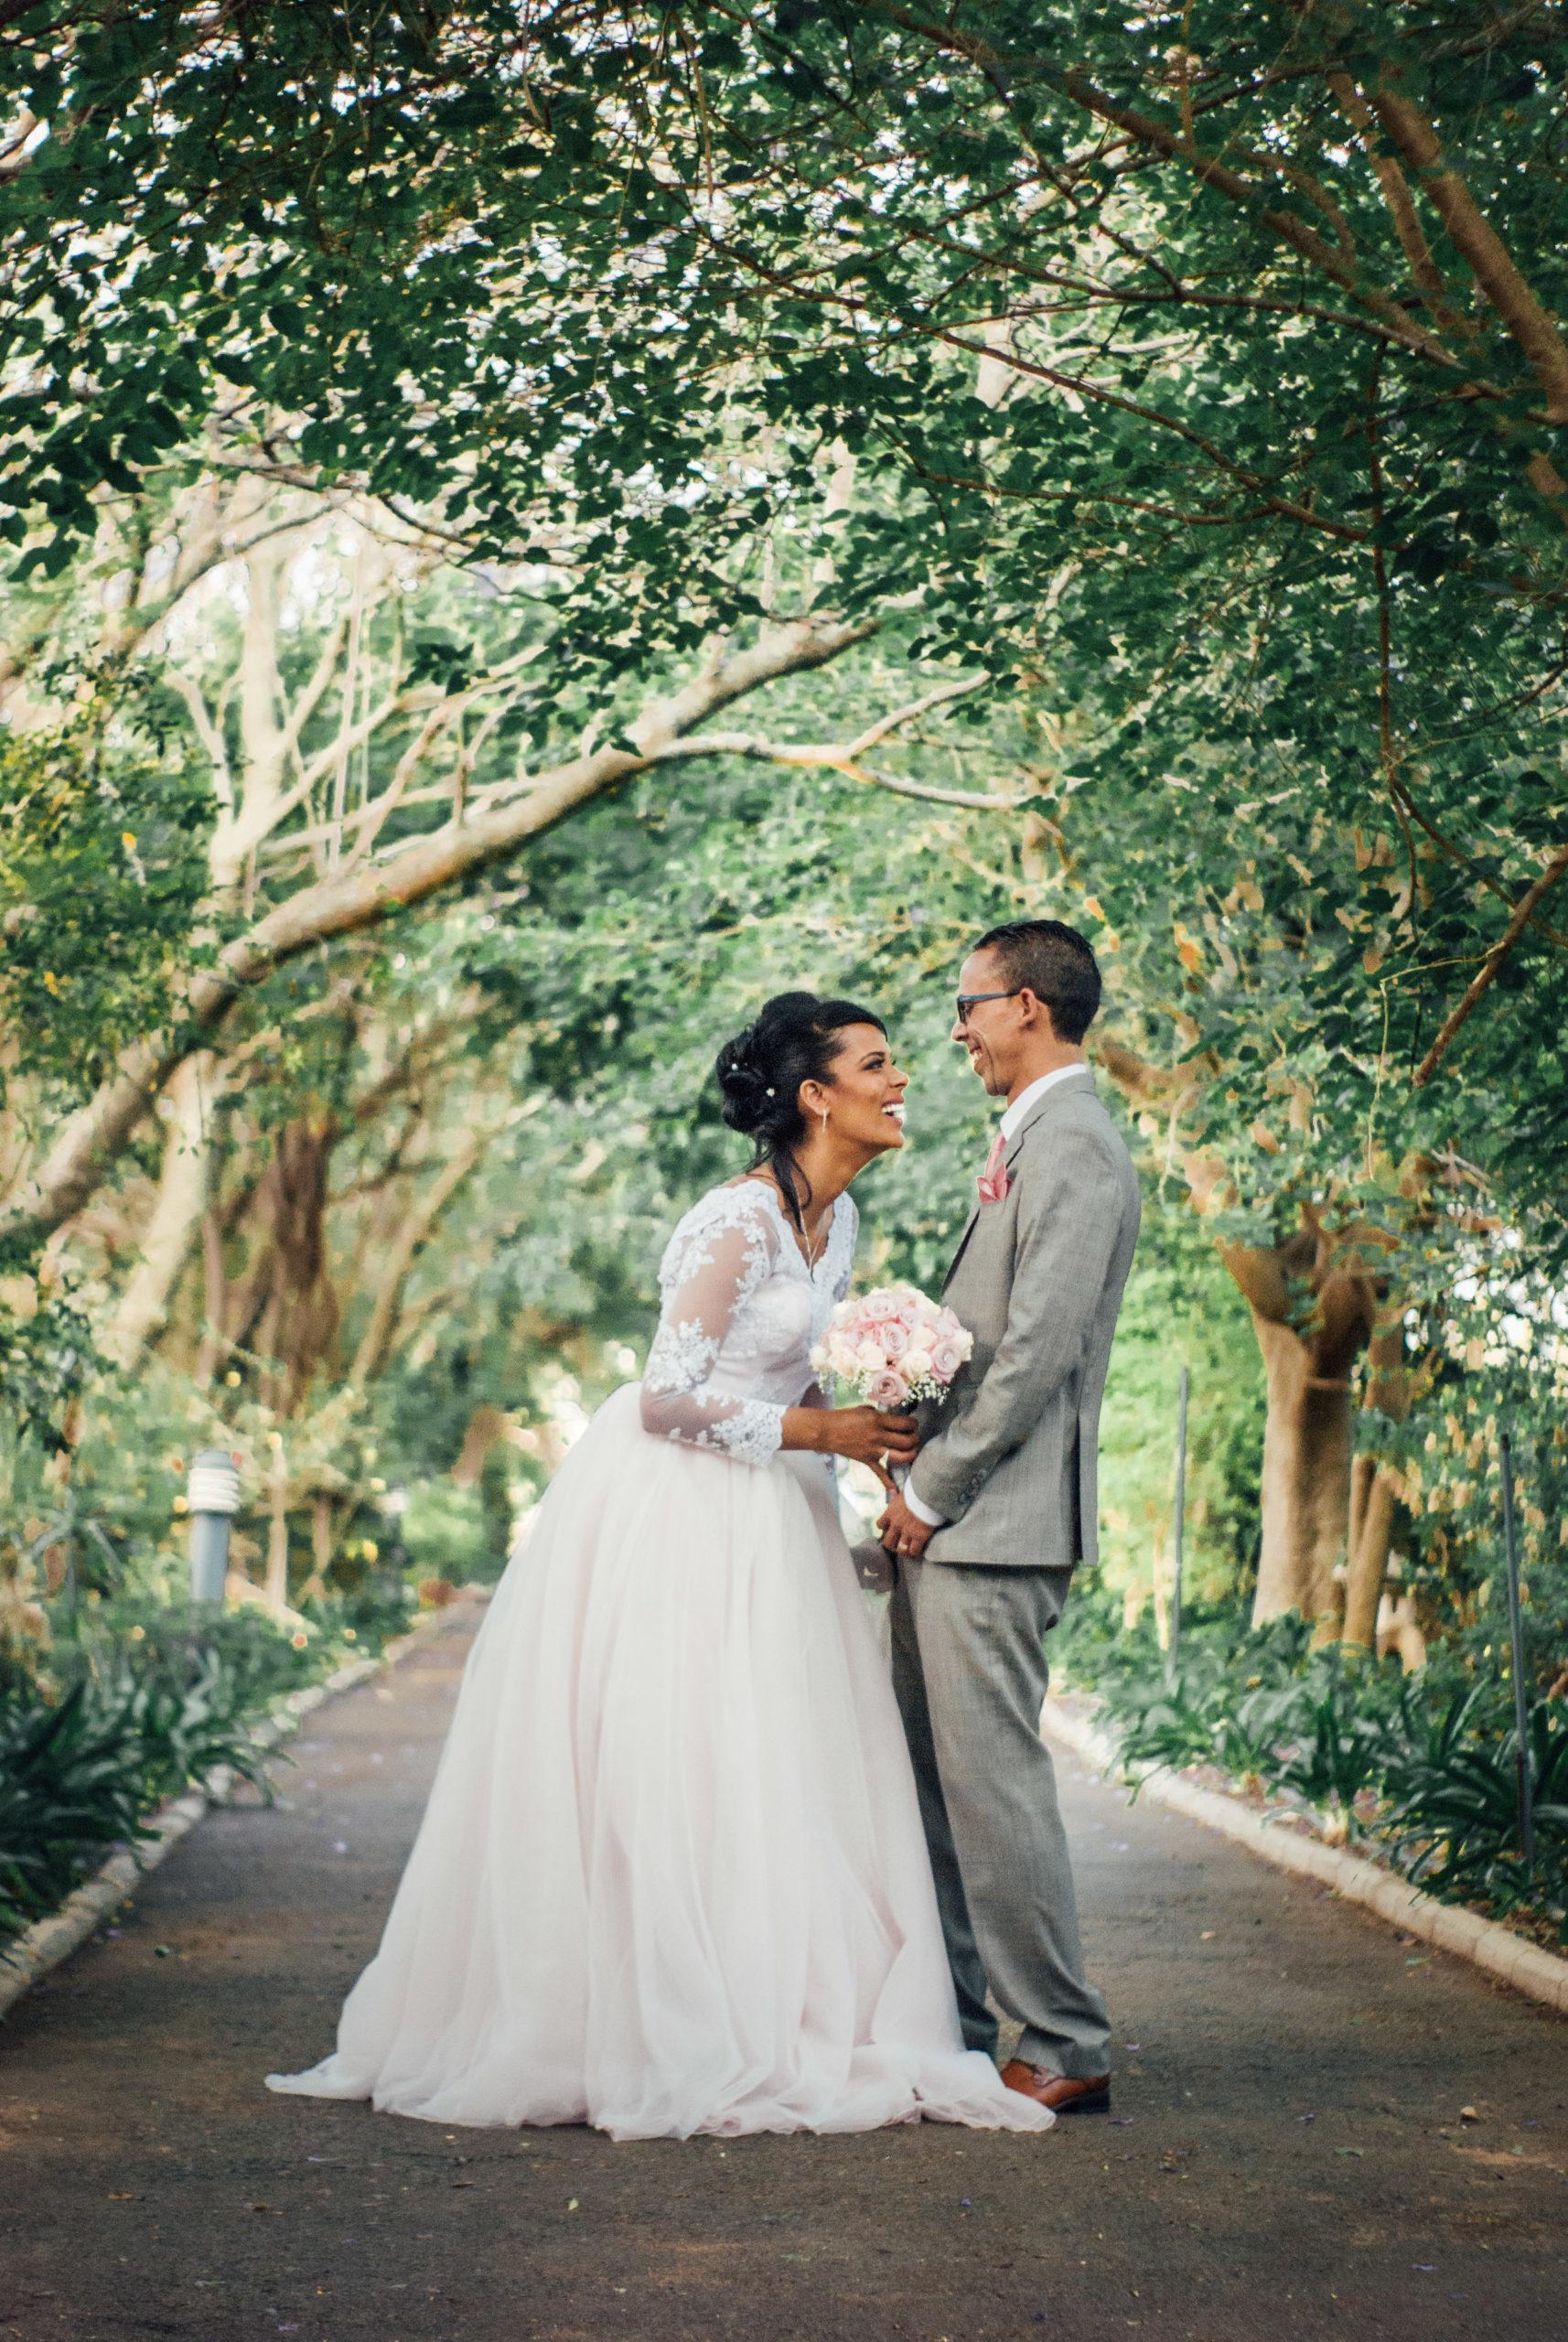 bride-groom-laughing-tress-pathway